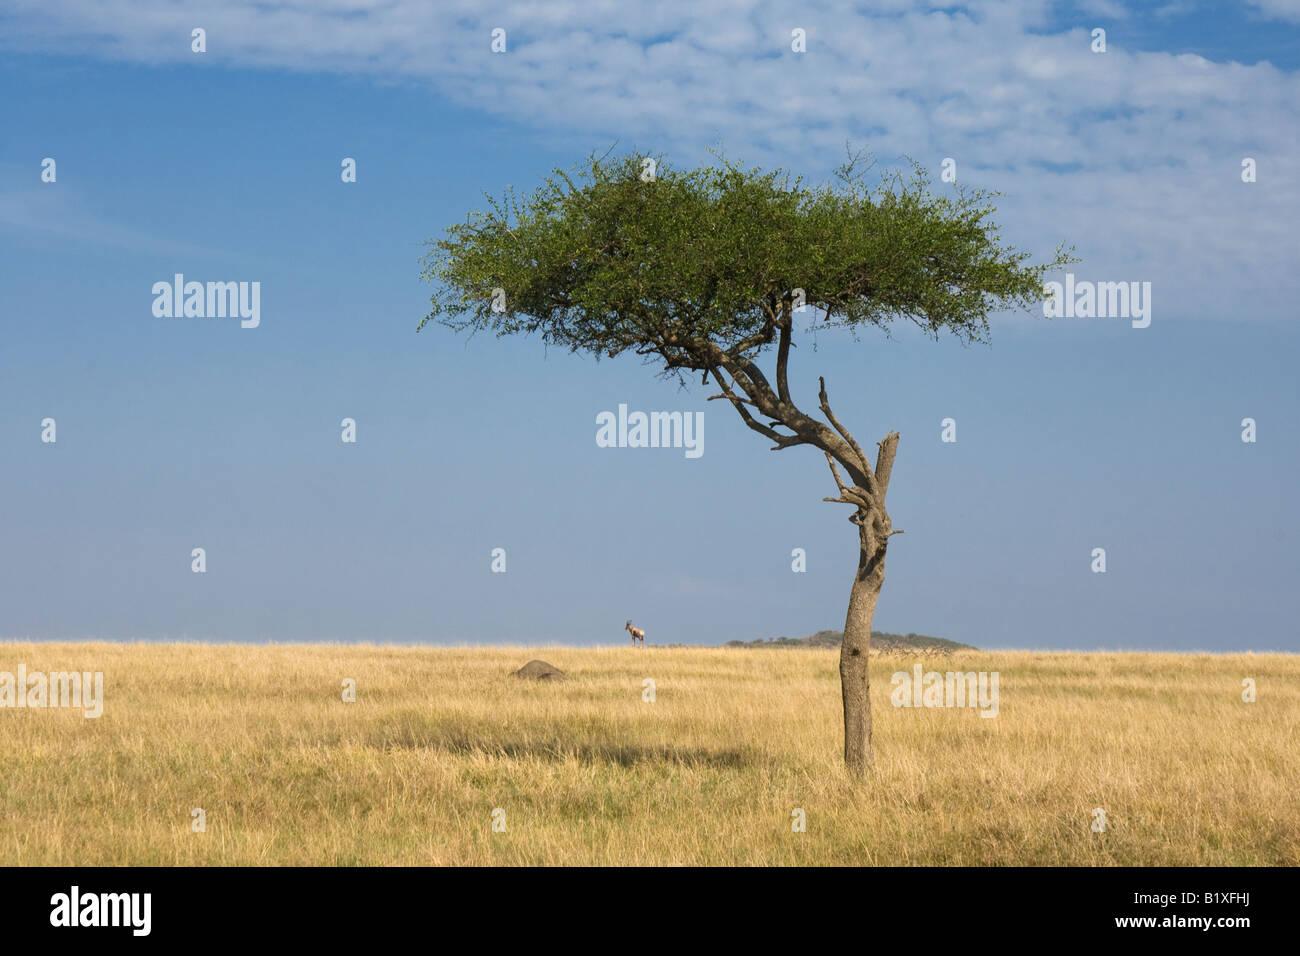 Topi and Shepard tree - Stock Image